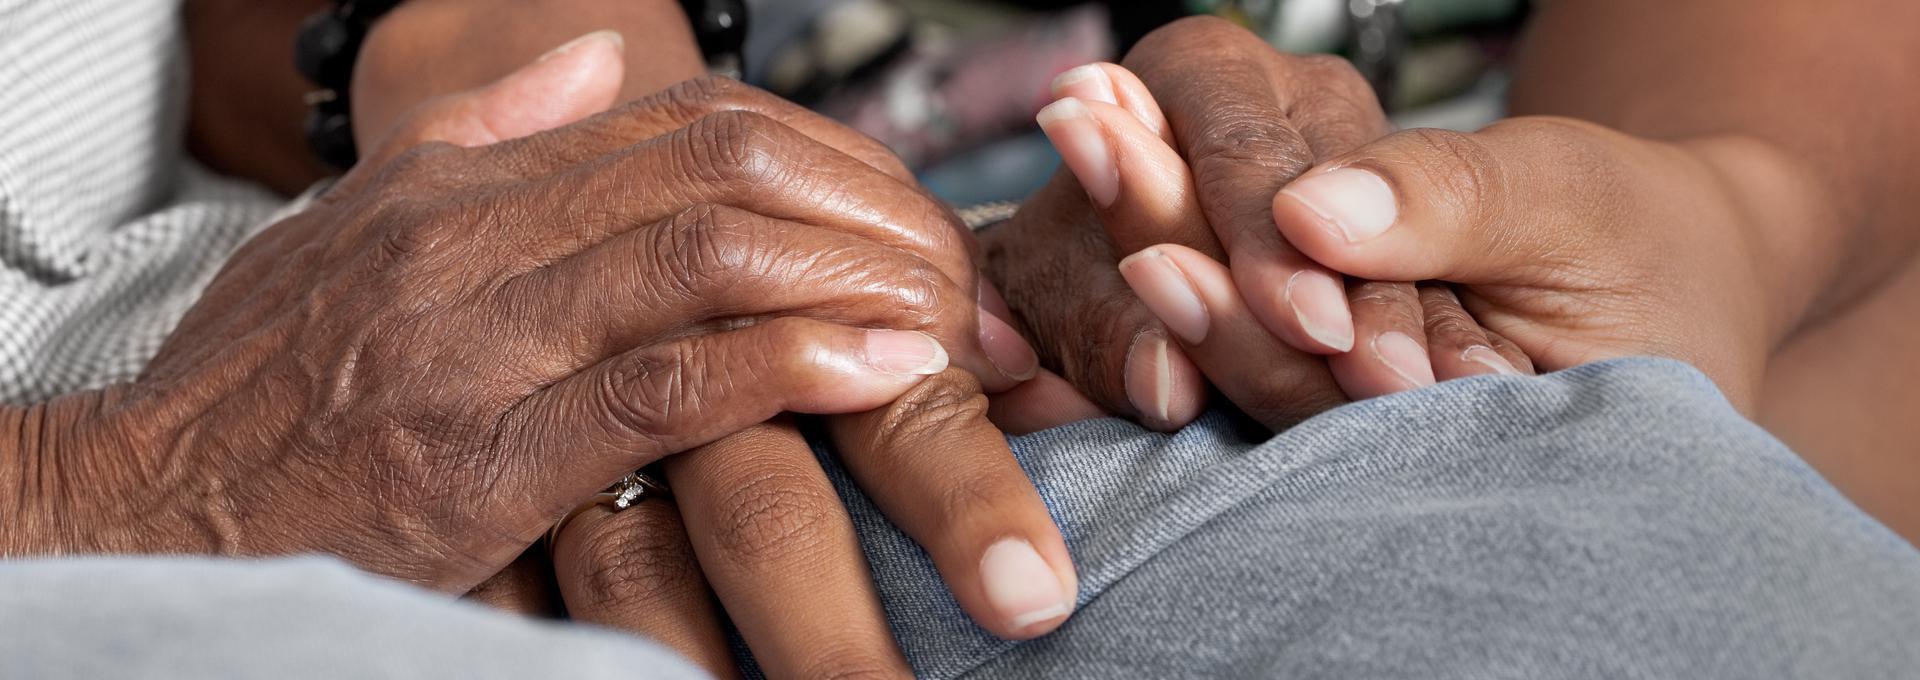 Legal Grandparent DNA Tests - info-hero